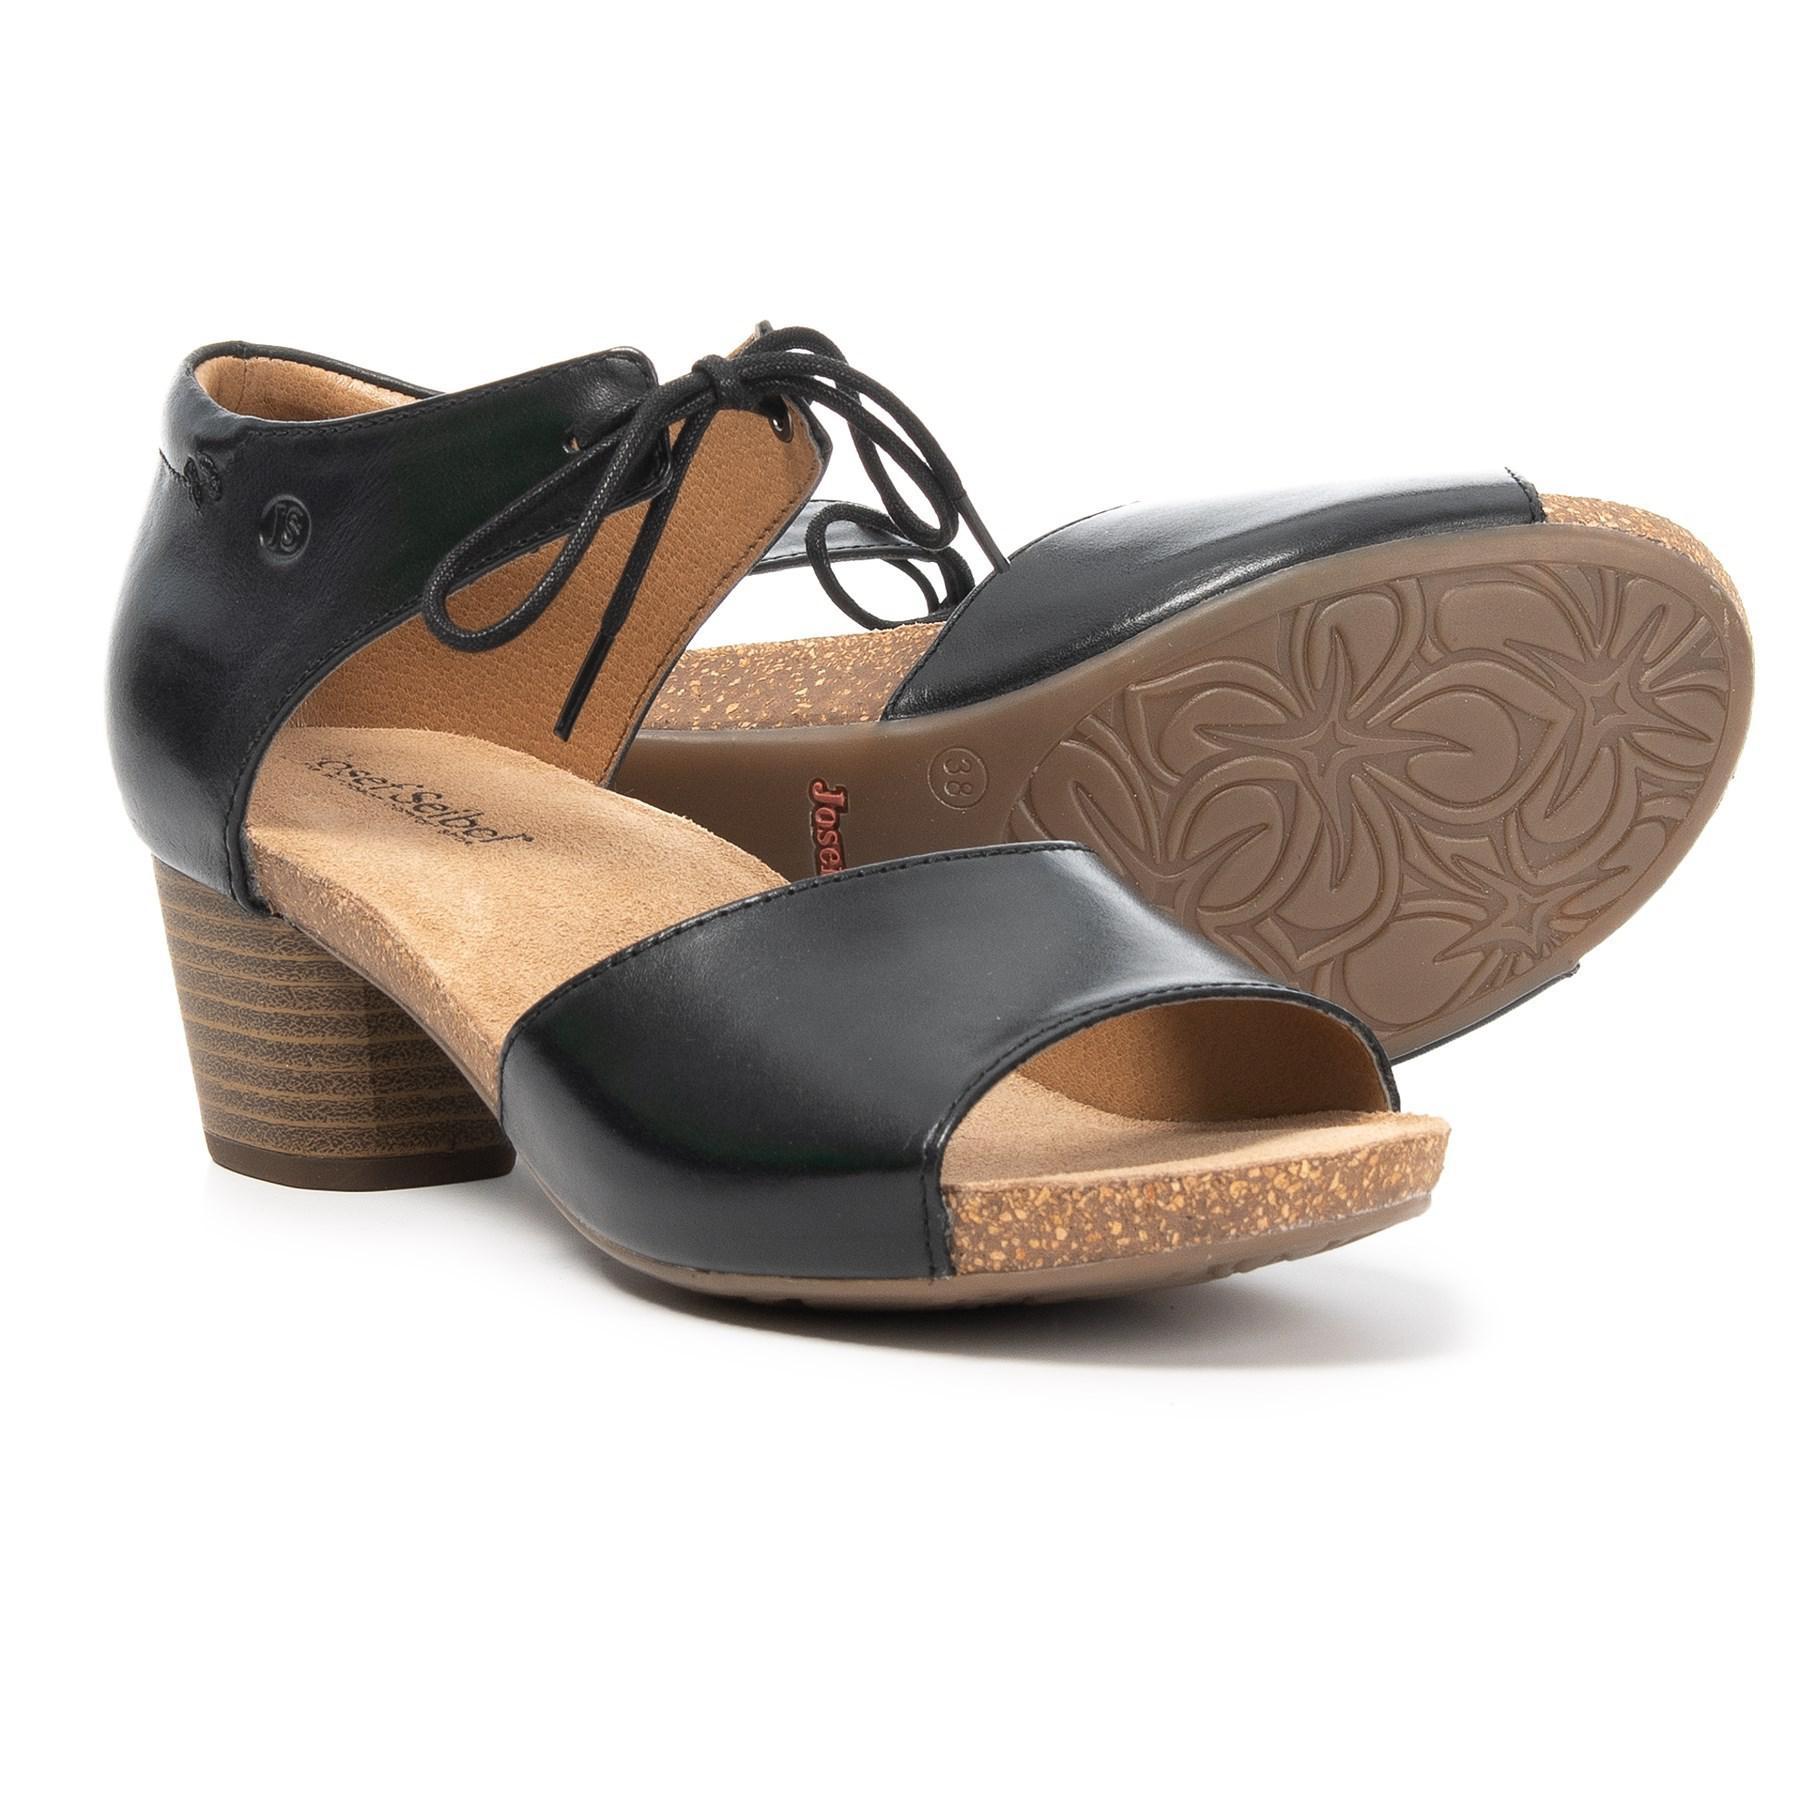 aff3ae1252b5 Lyst - Josef Seibel Rose 23 Open-toe Sandals in Black